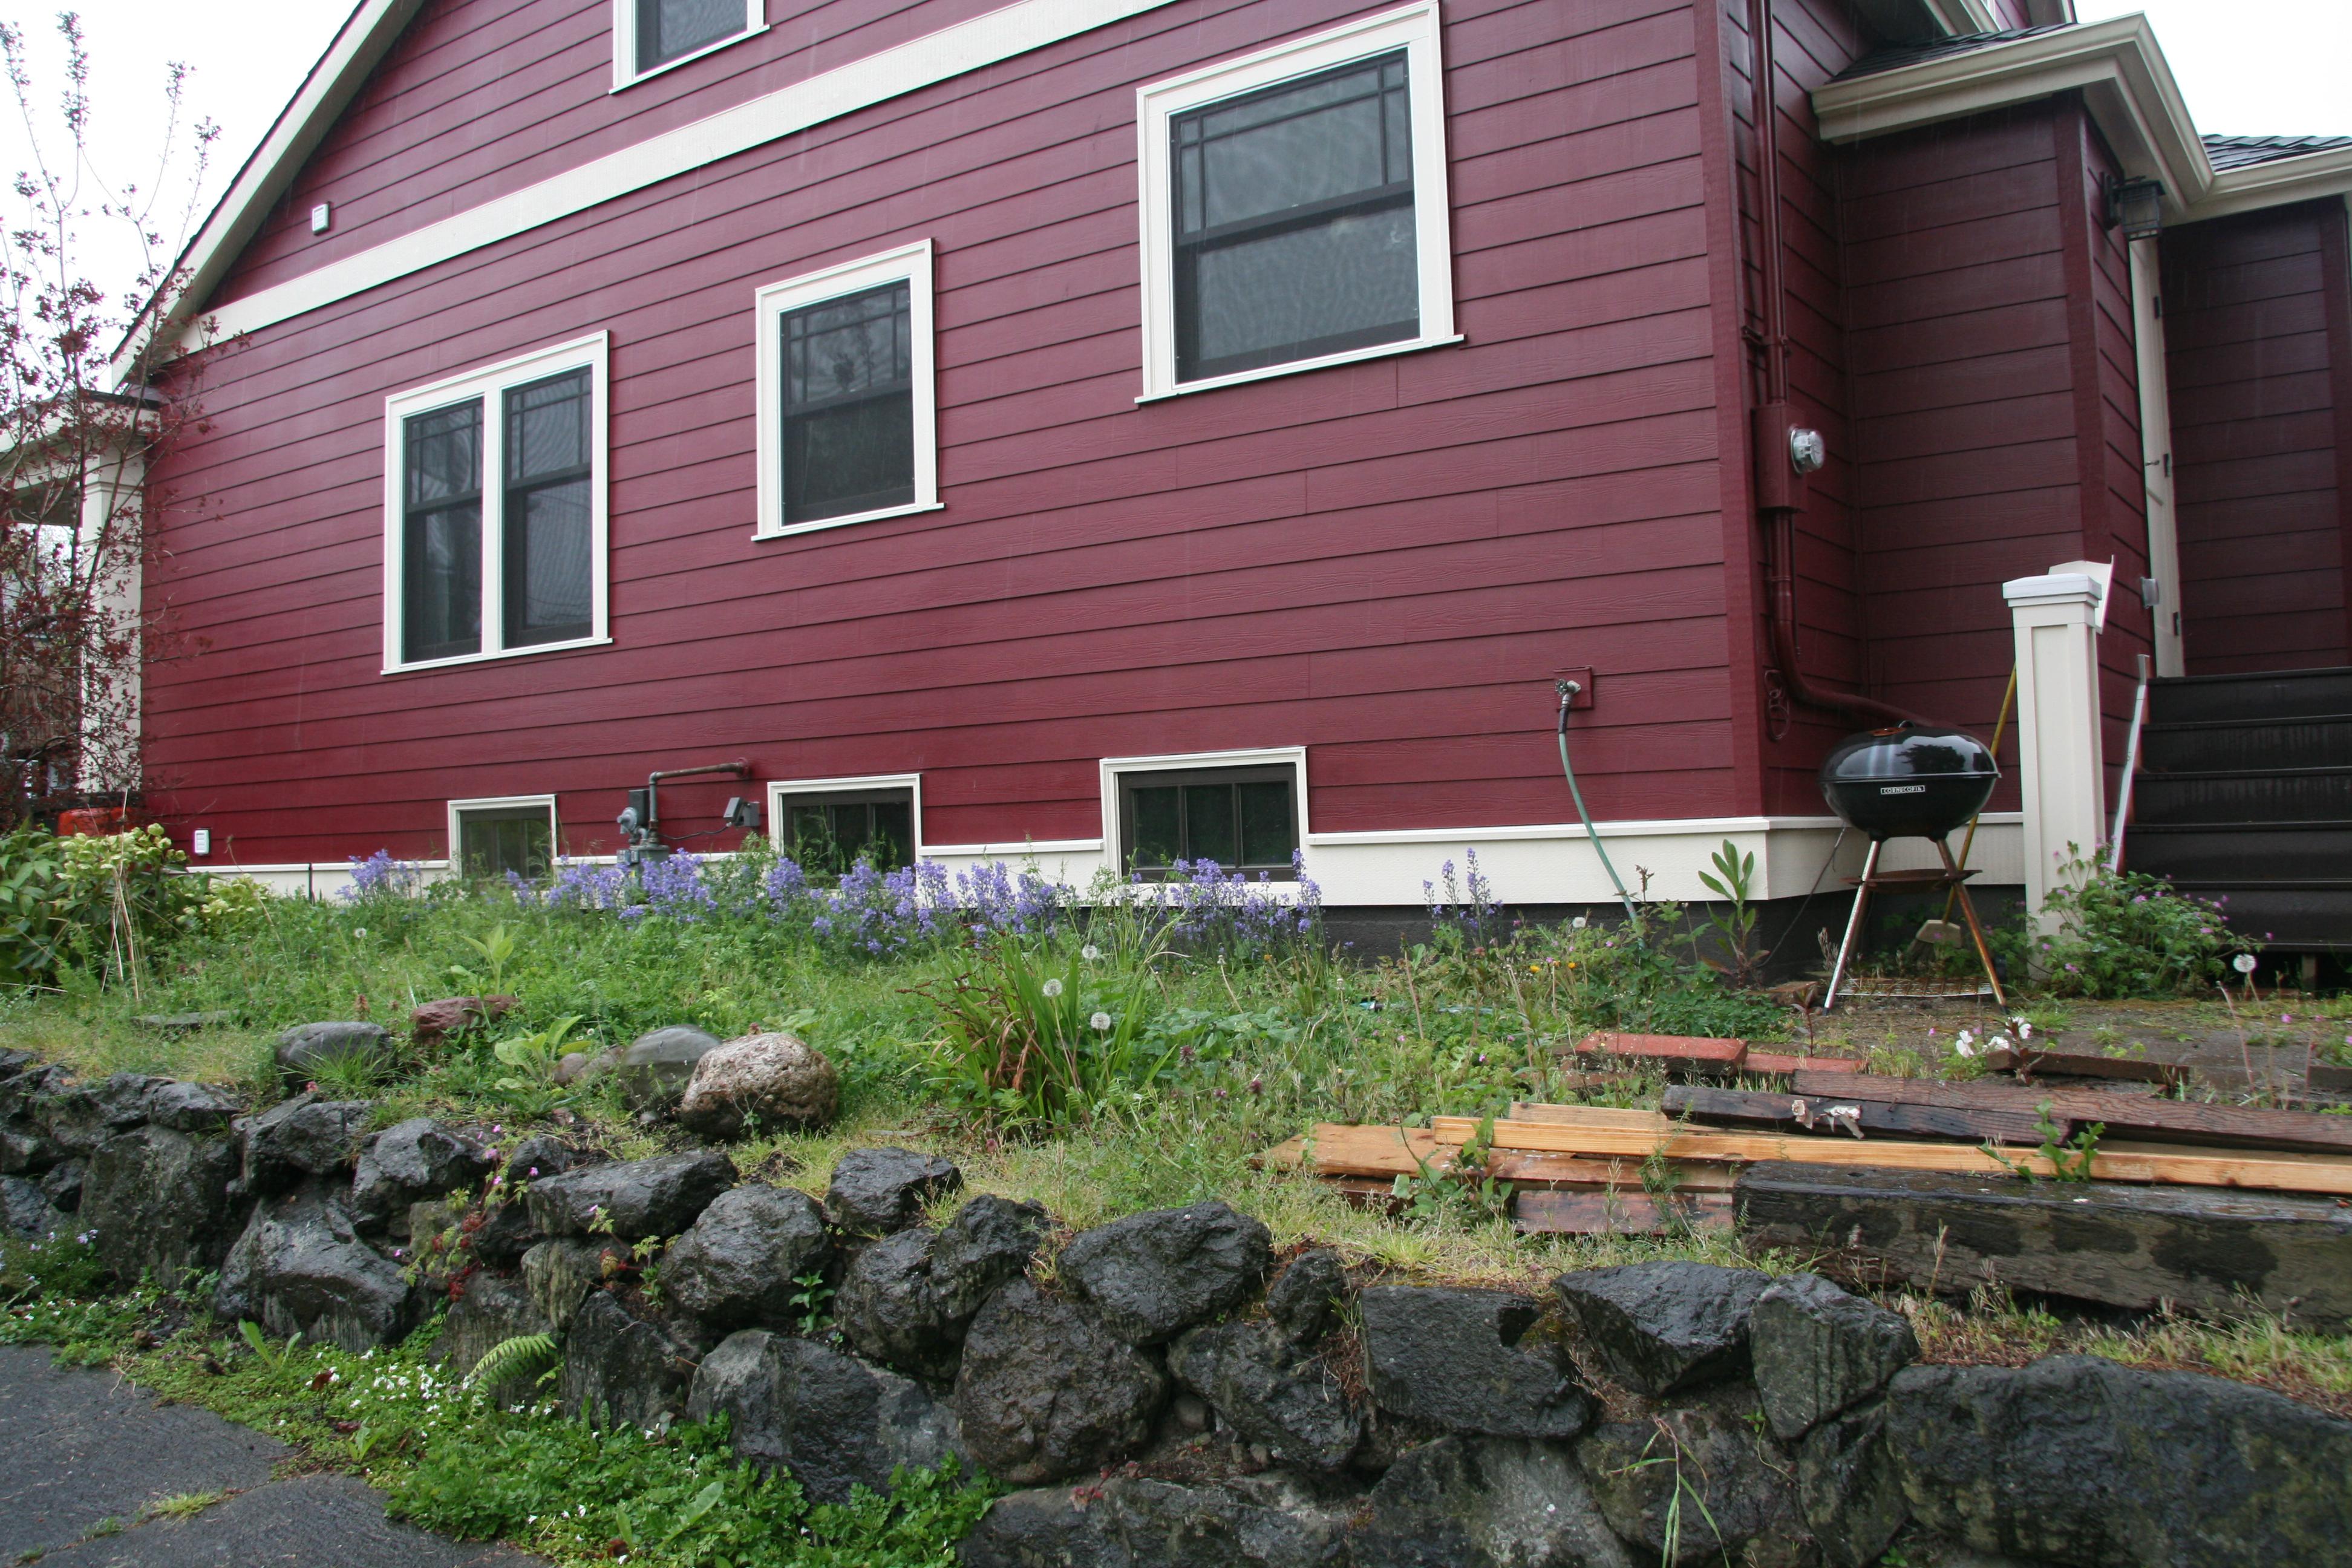 Garden Treasures Patio Heater Review Patio Heater Review